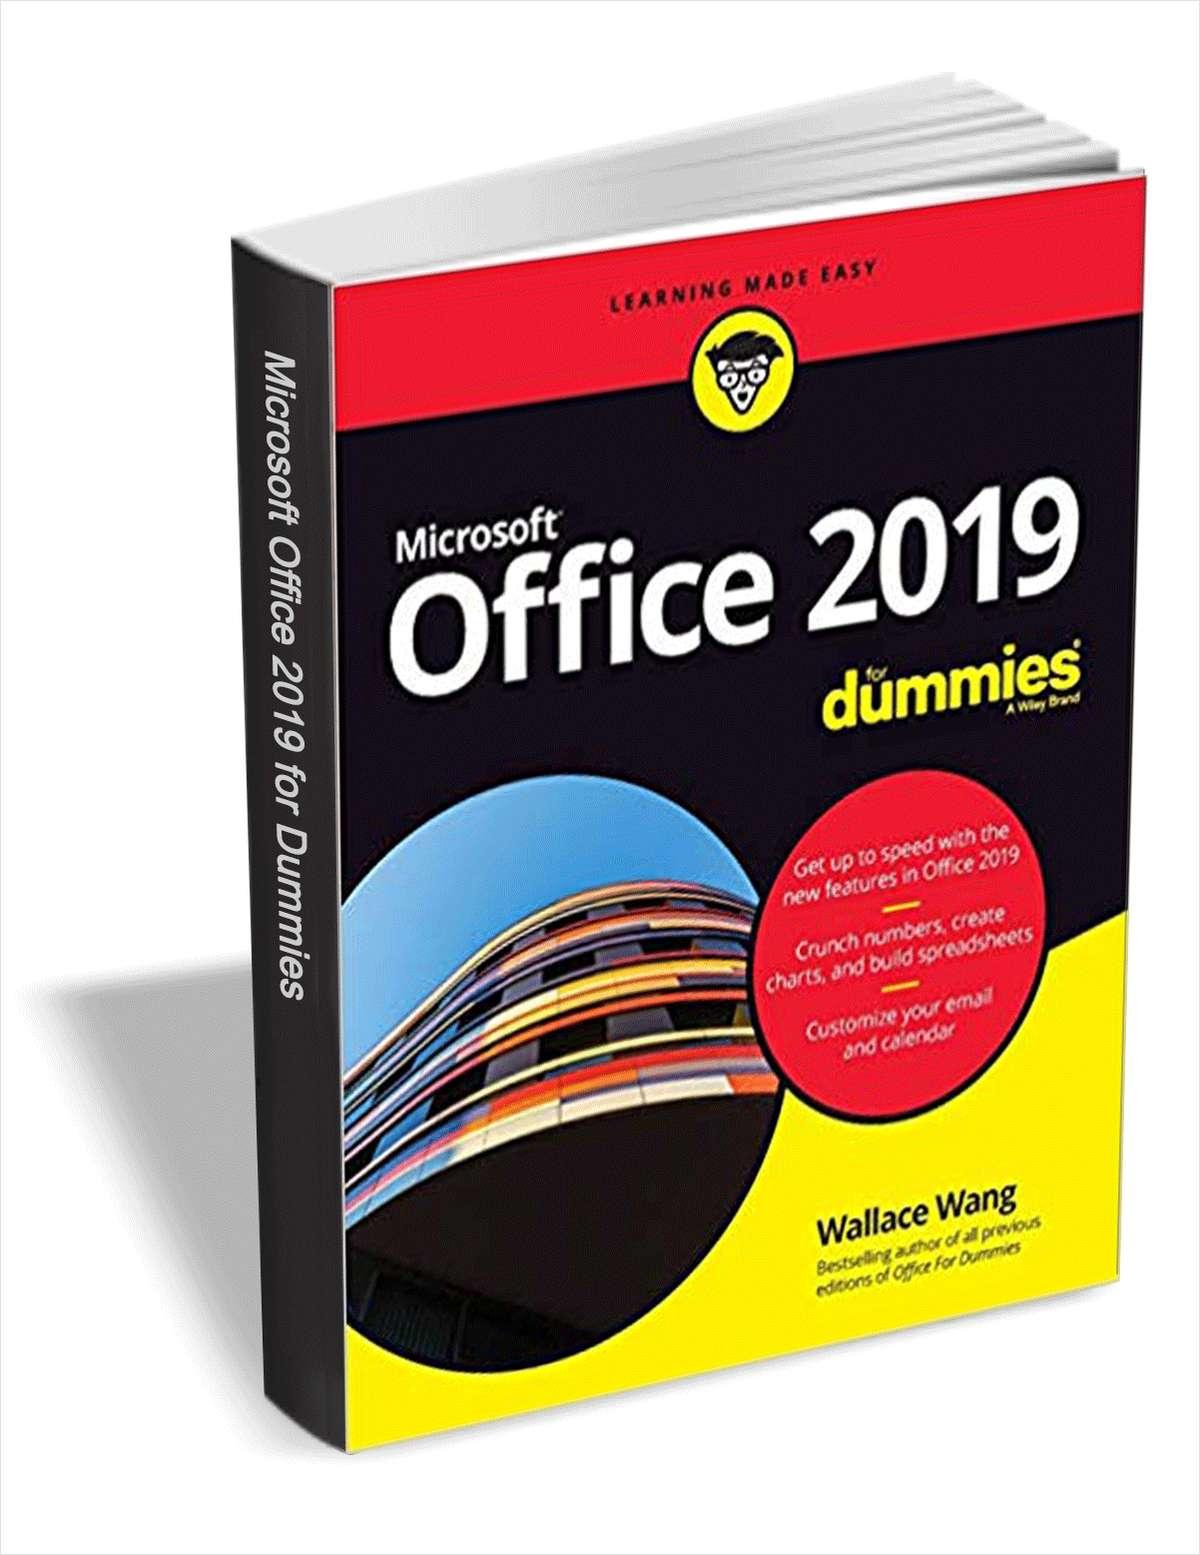 Kostenlos: Office 2019 For Dummies (eBook) + viele andere!